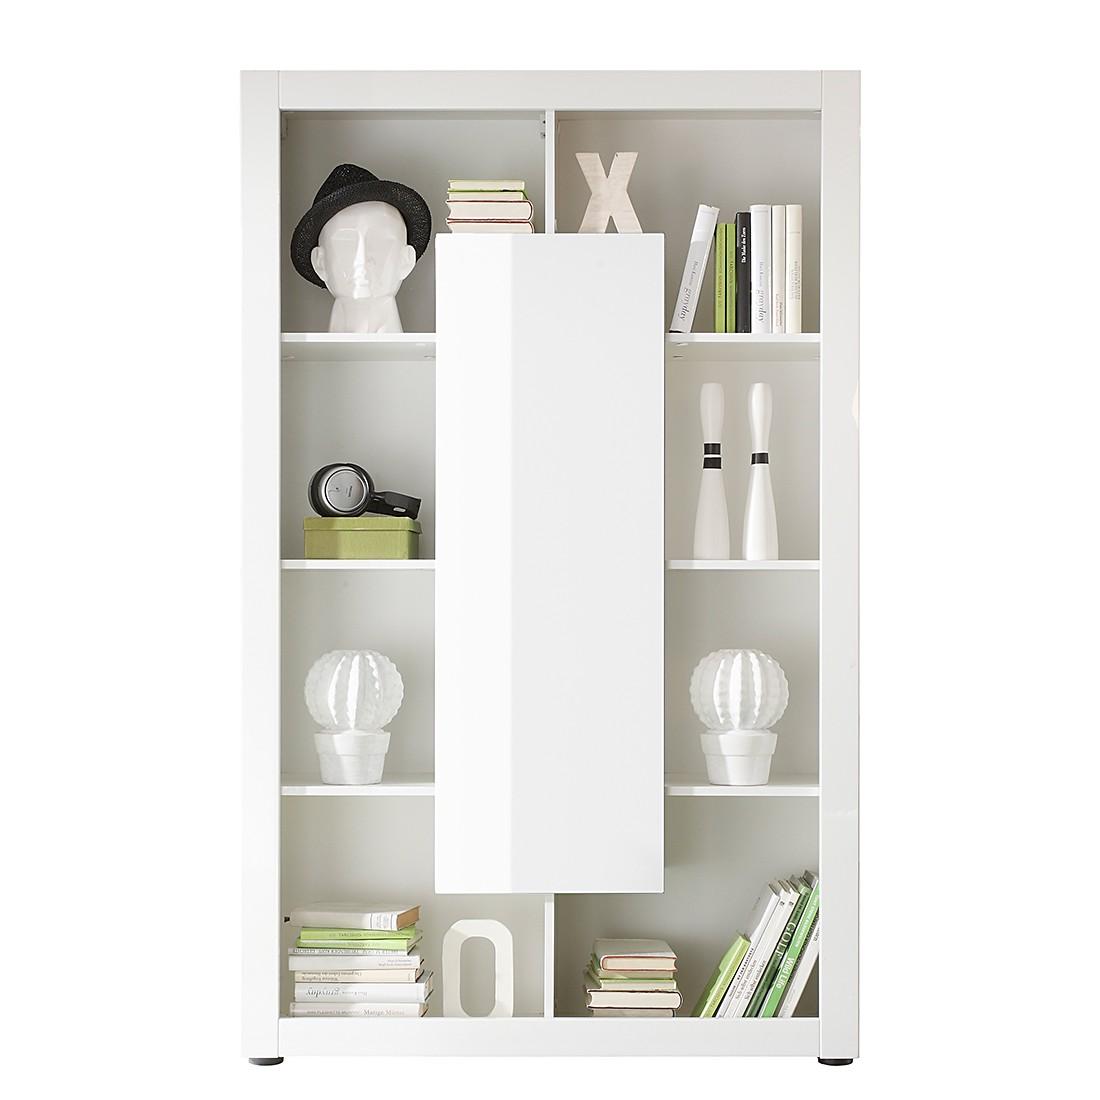 wandregal easy coloured i matt wei hochglanz wei roomscape g nstig kaufen. Black Bedroom Furniture Sets. Home Design Ideas